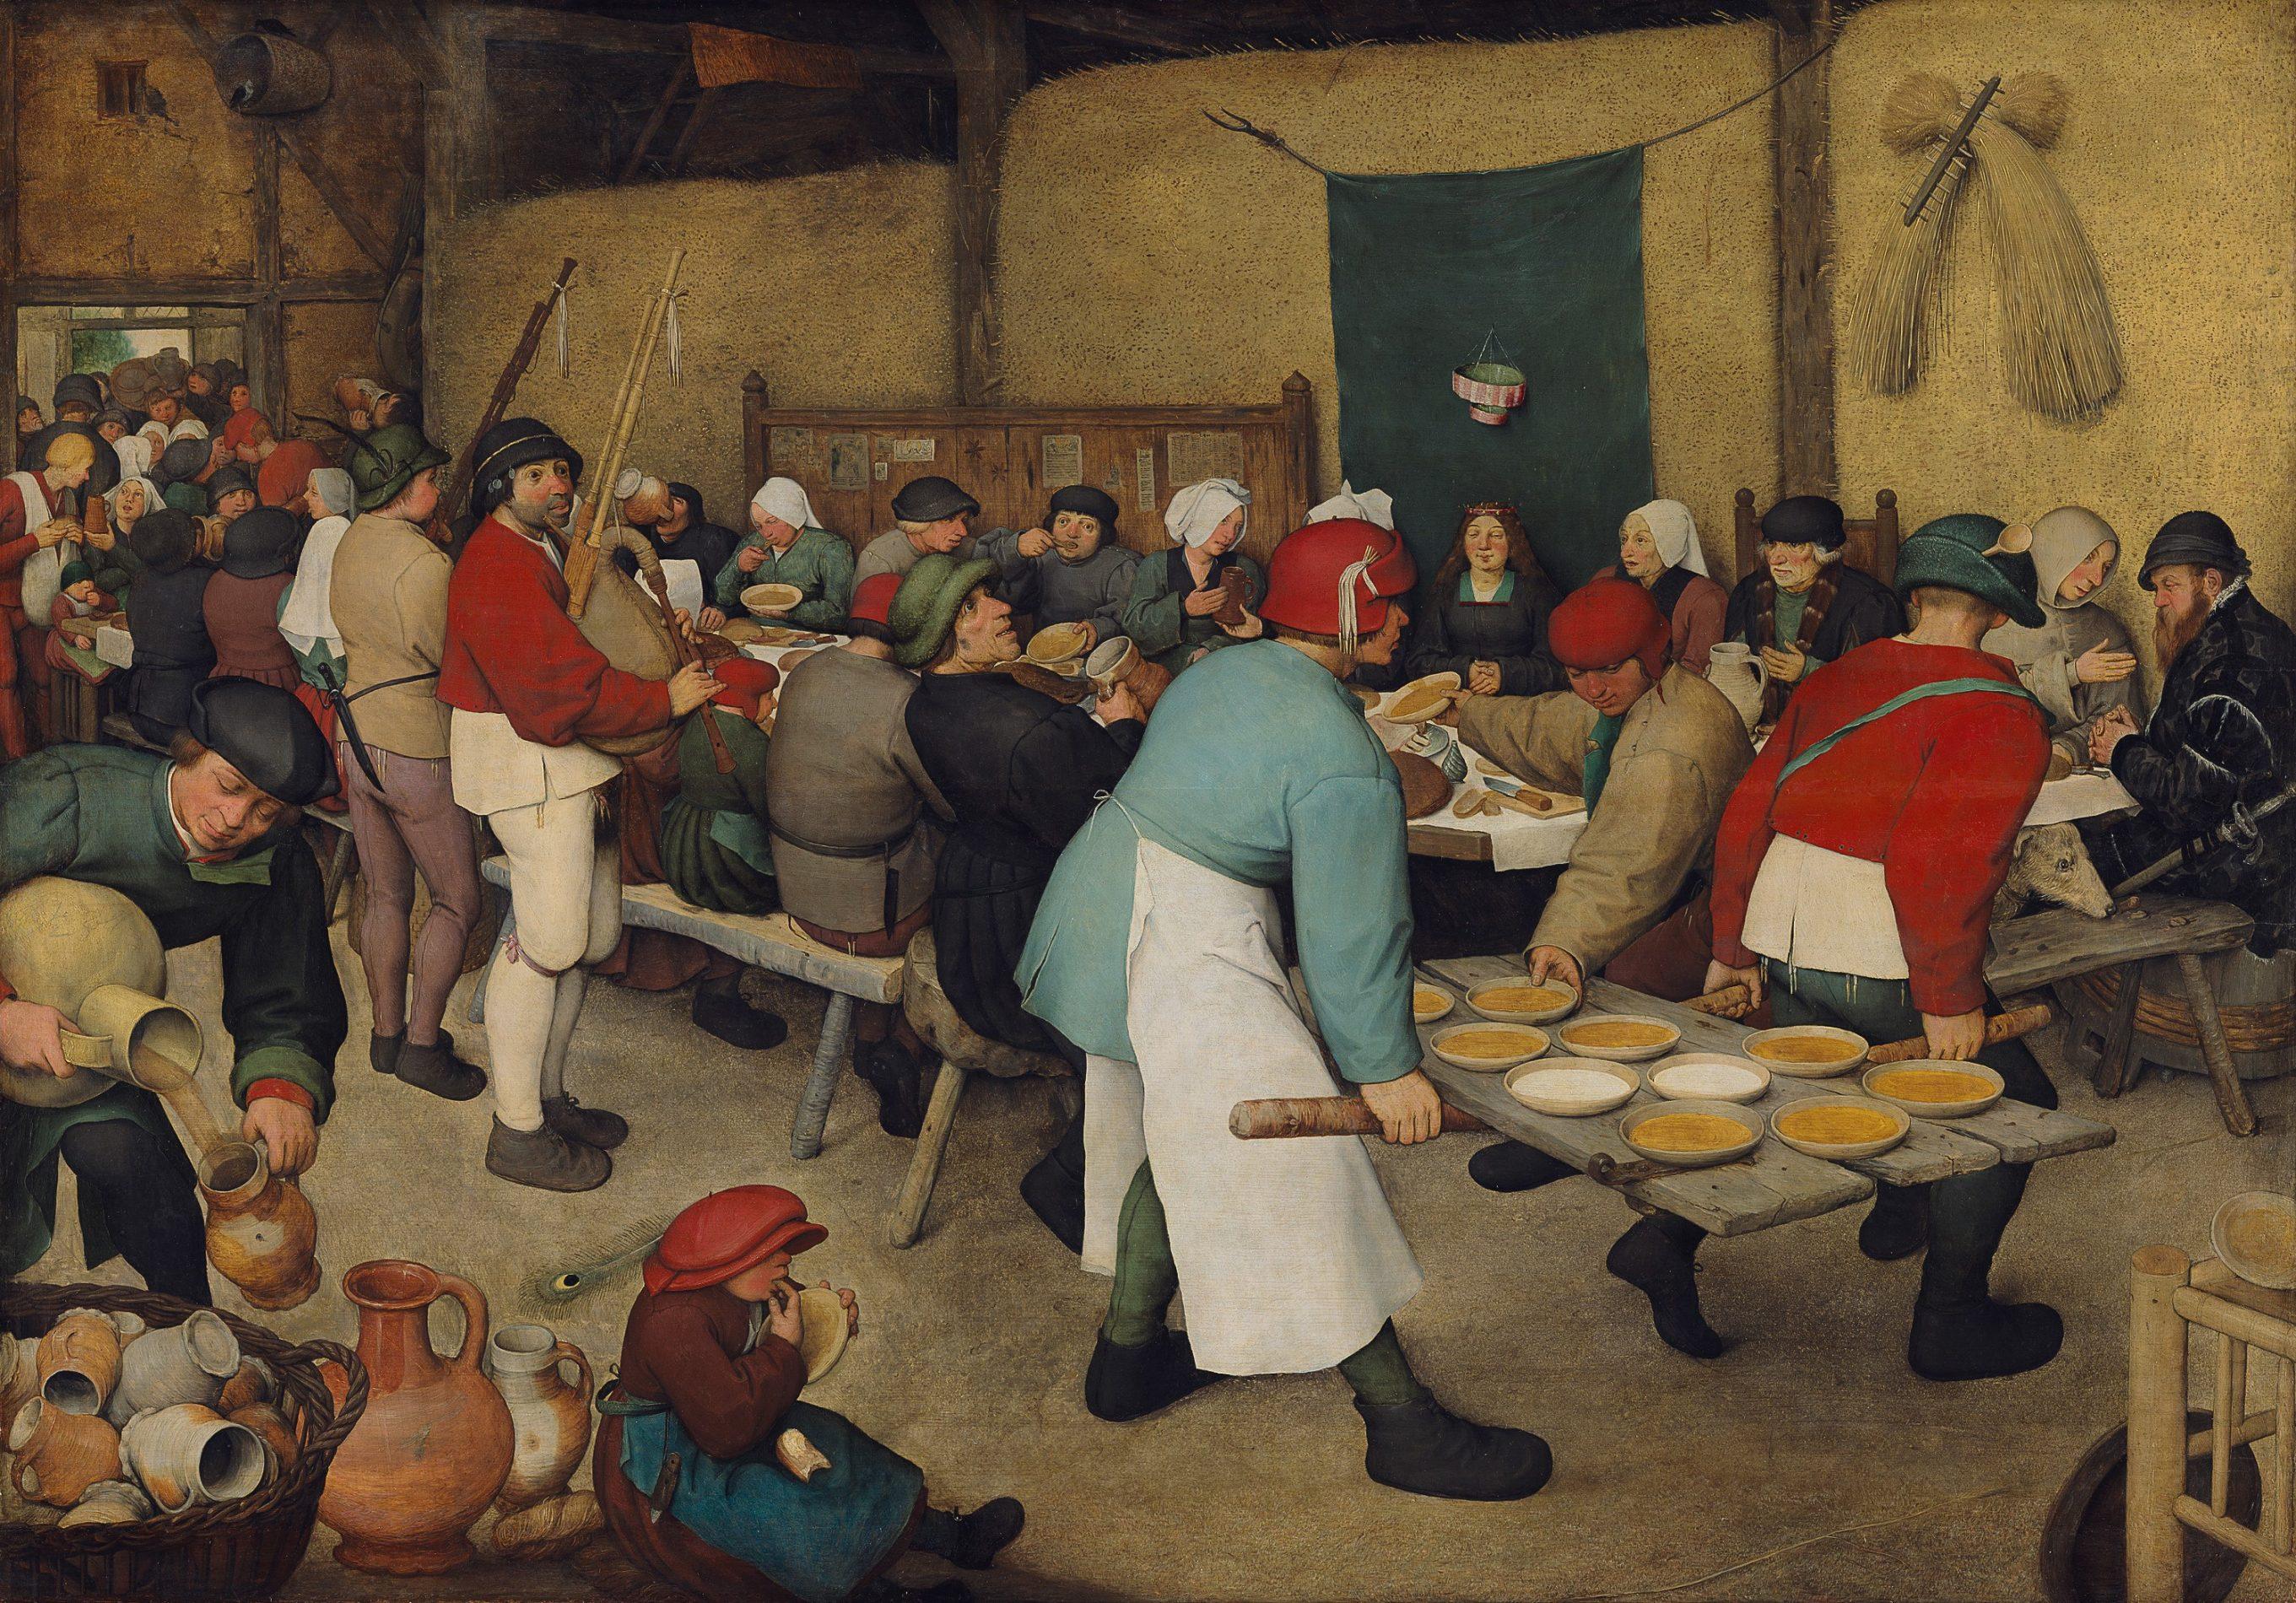 For the Holiday Season: Pieter Brueghel, the Elder